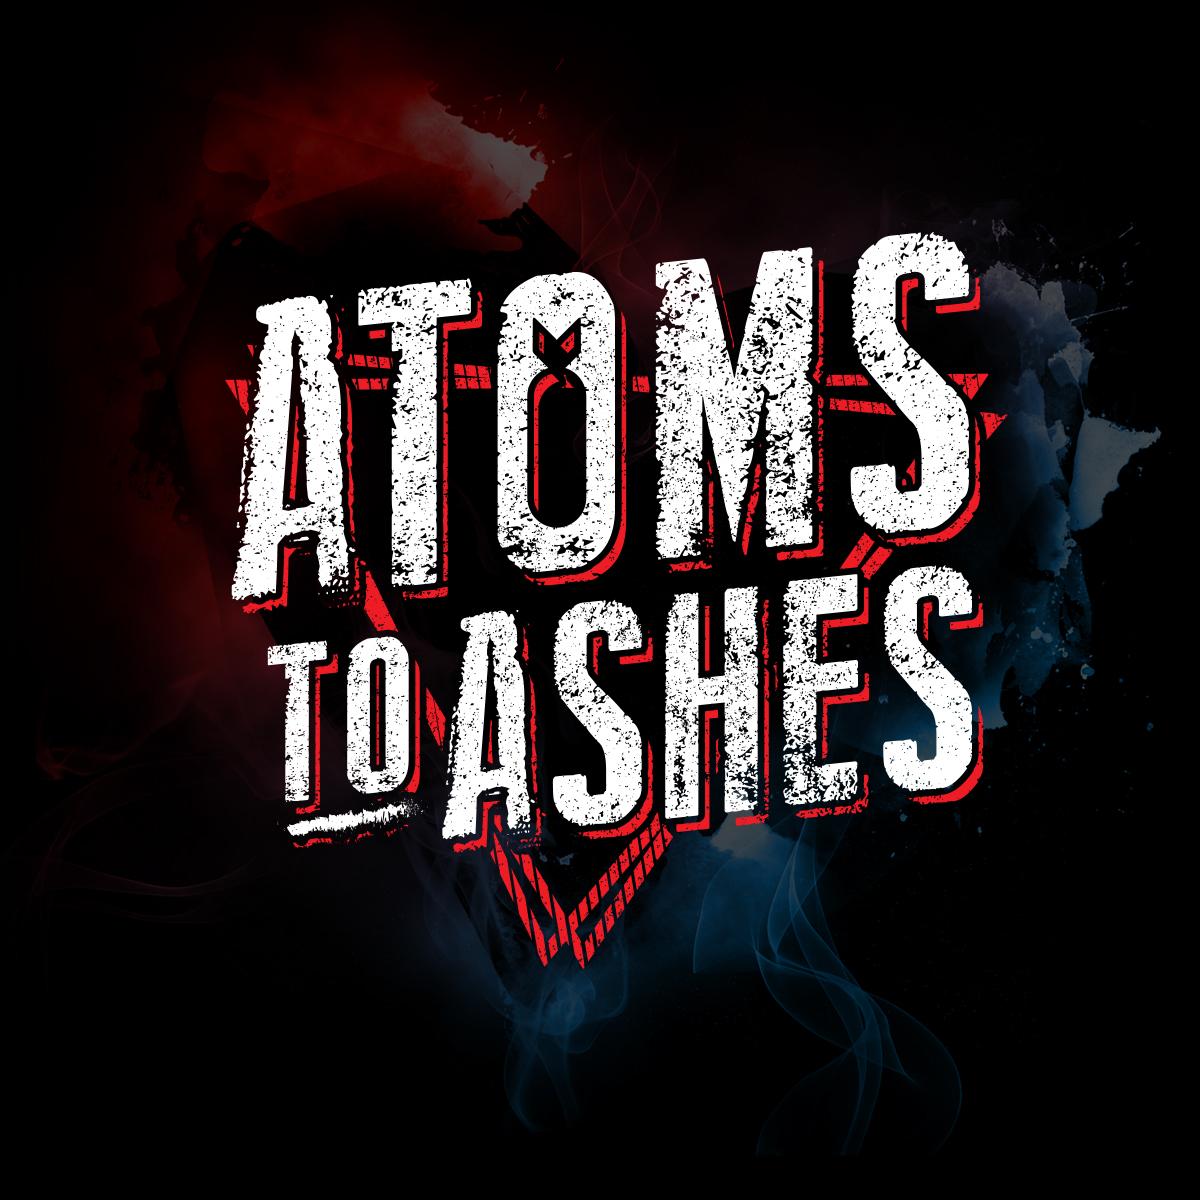 logo groupe de musique Atoms to ashes Image de marque